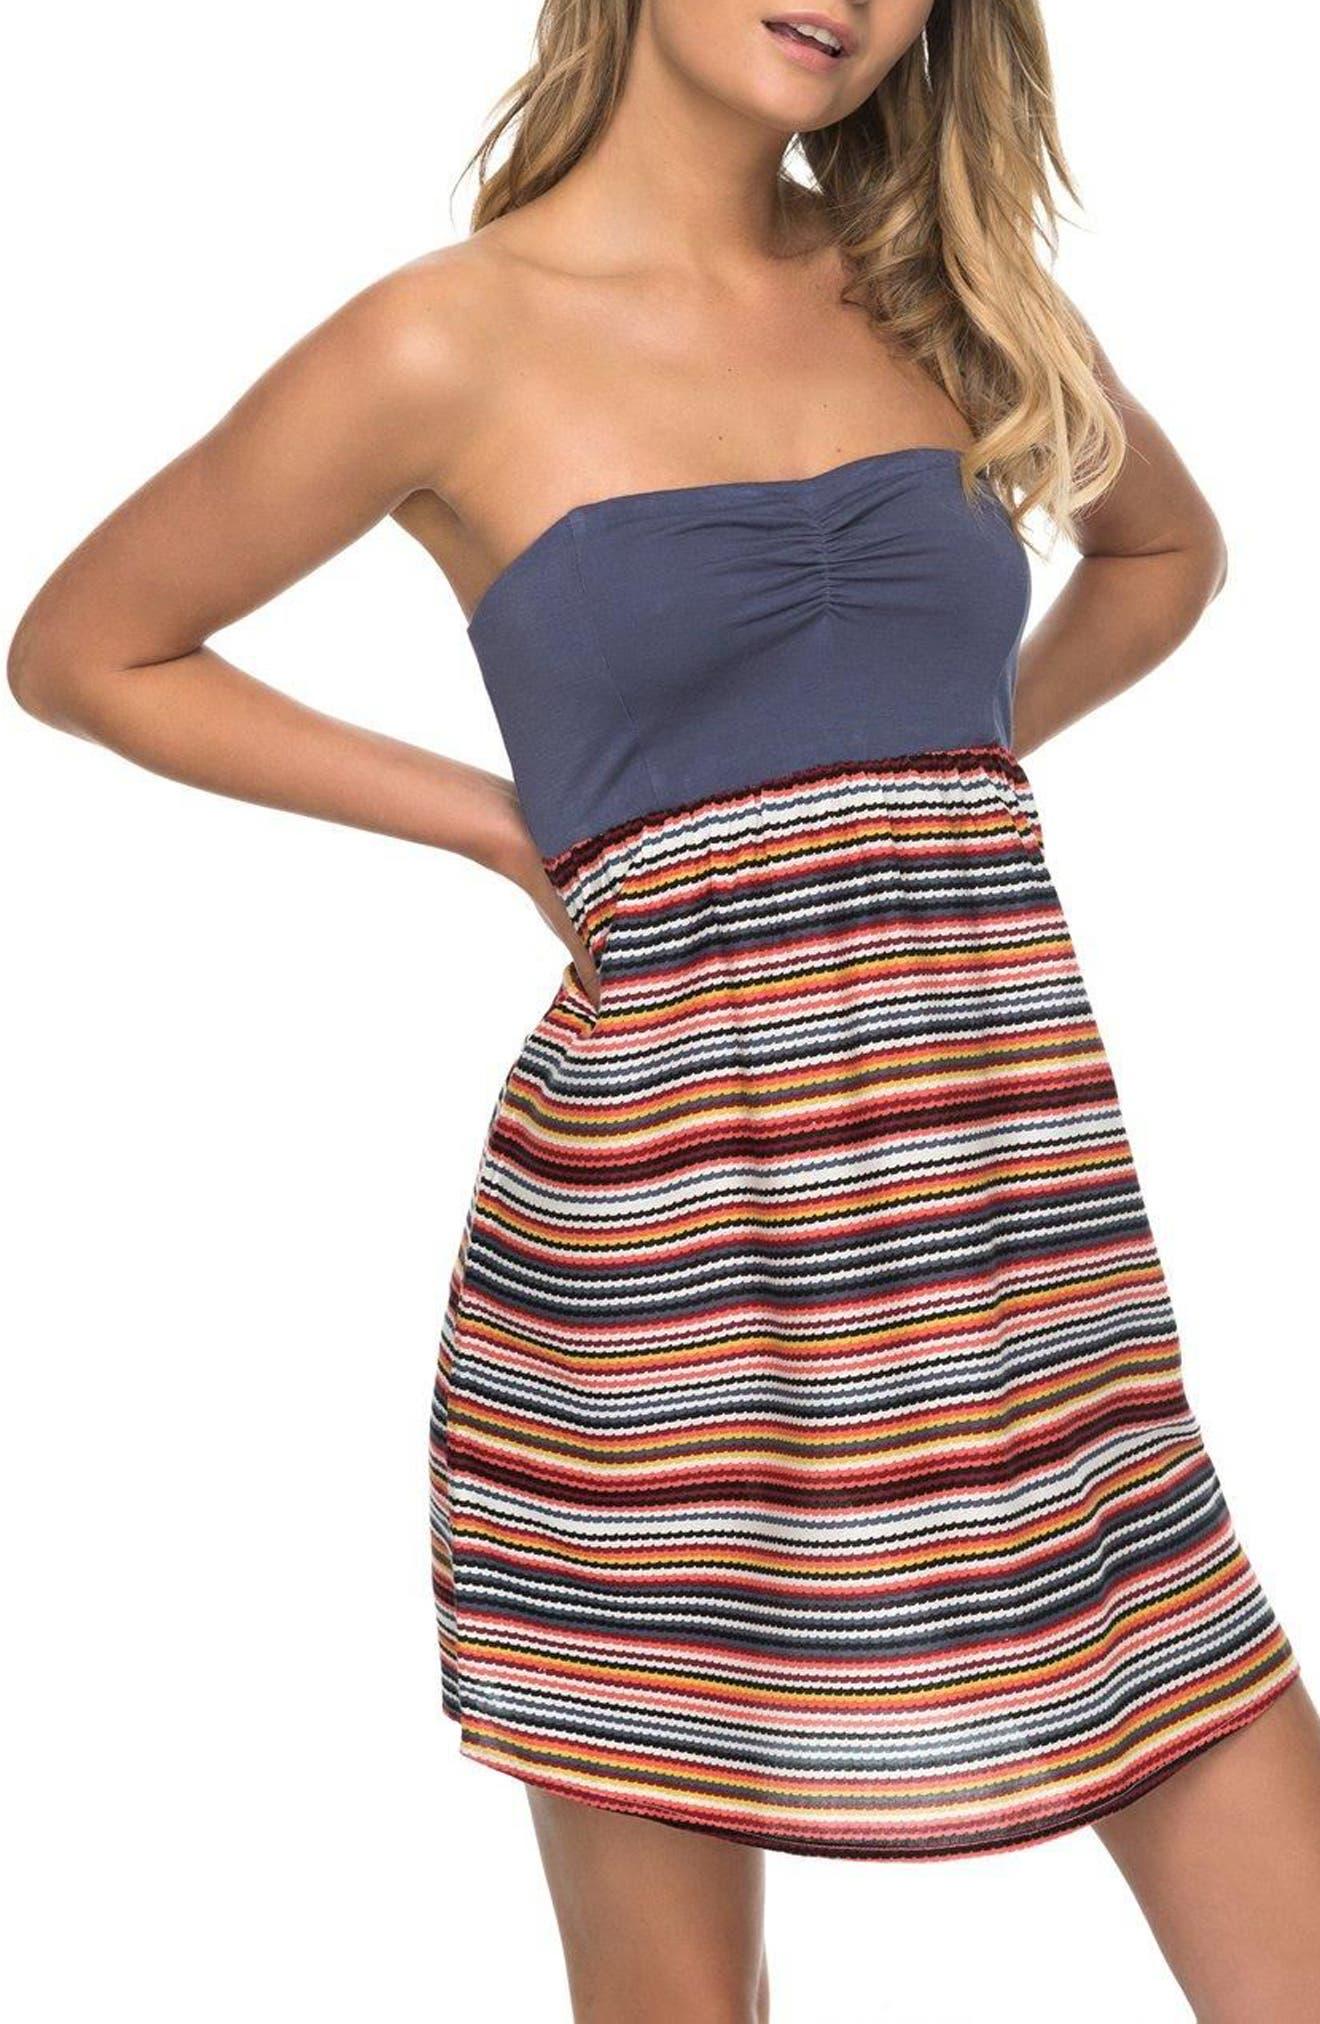 Ocean Romance Strapless Dress,                         Main,                         color, Rio Red Zigzag Stripe